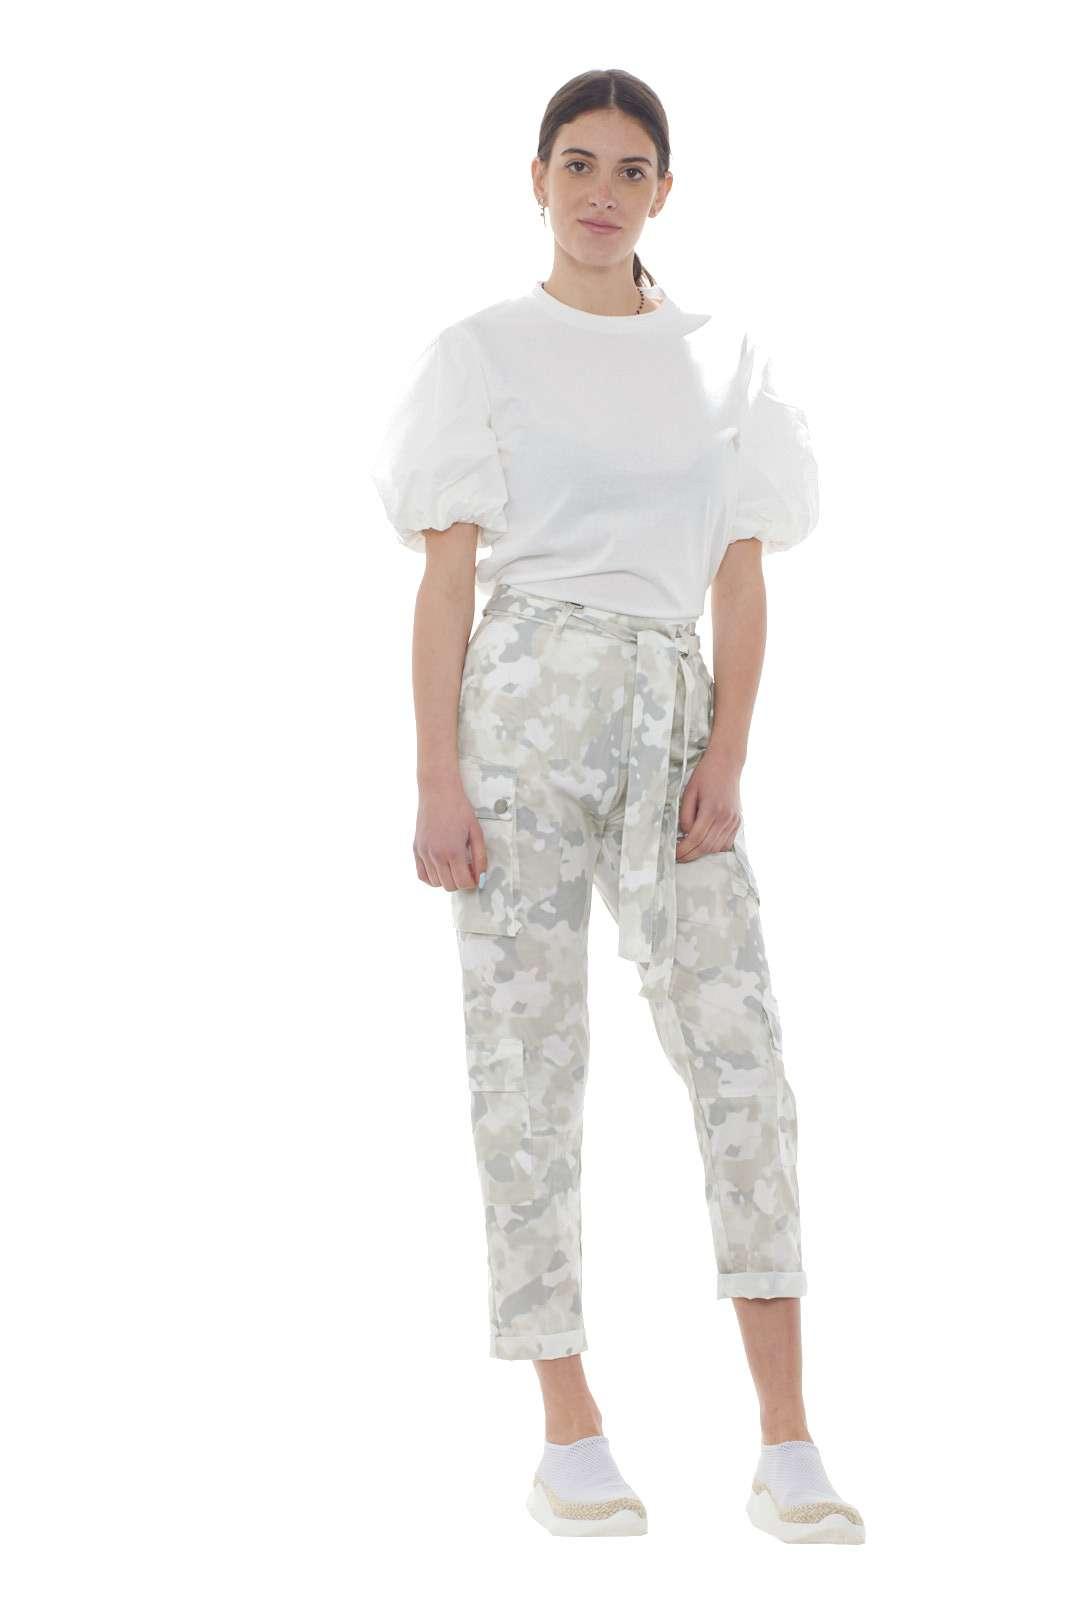 https://www.parmax.com/media/catalog/product/a/i/PE-outlet_parmax-t-shirt-donna-Pinko-1b14gk-D_1.jpg